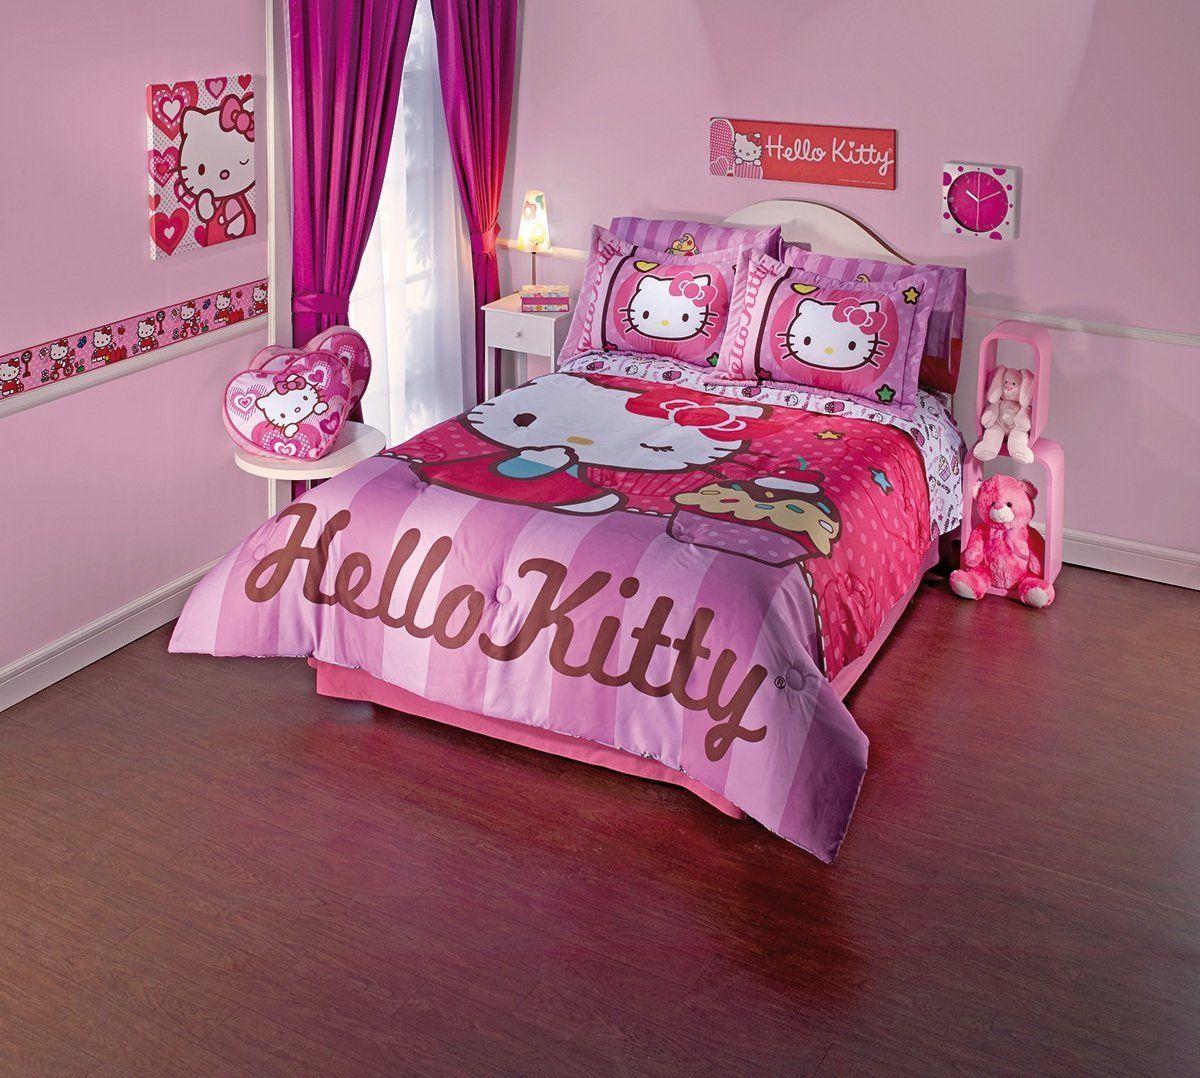 Hello Kitty Bedroom Ideas Decor Design Diy Offices Kids For Teens Girls Furni Hello Kitty Bedroom Hello Kitty Bedroom Furniture Hello Kitty Bedroom Set